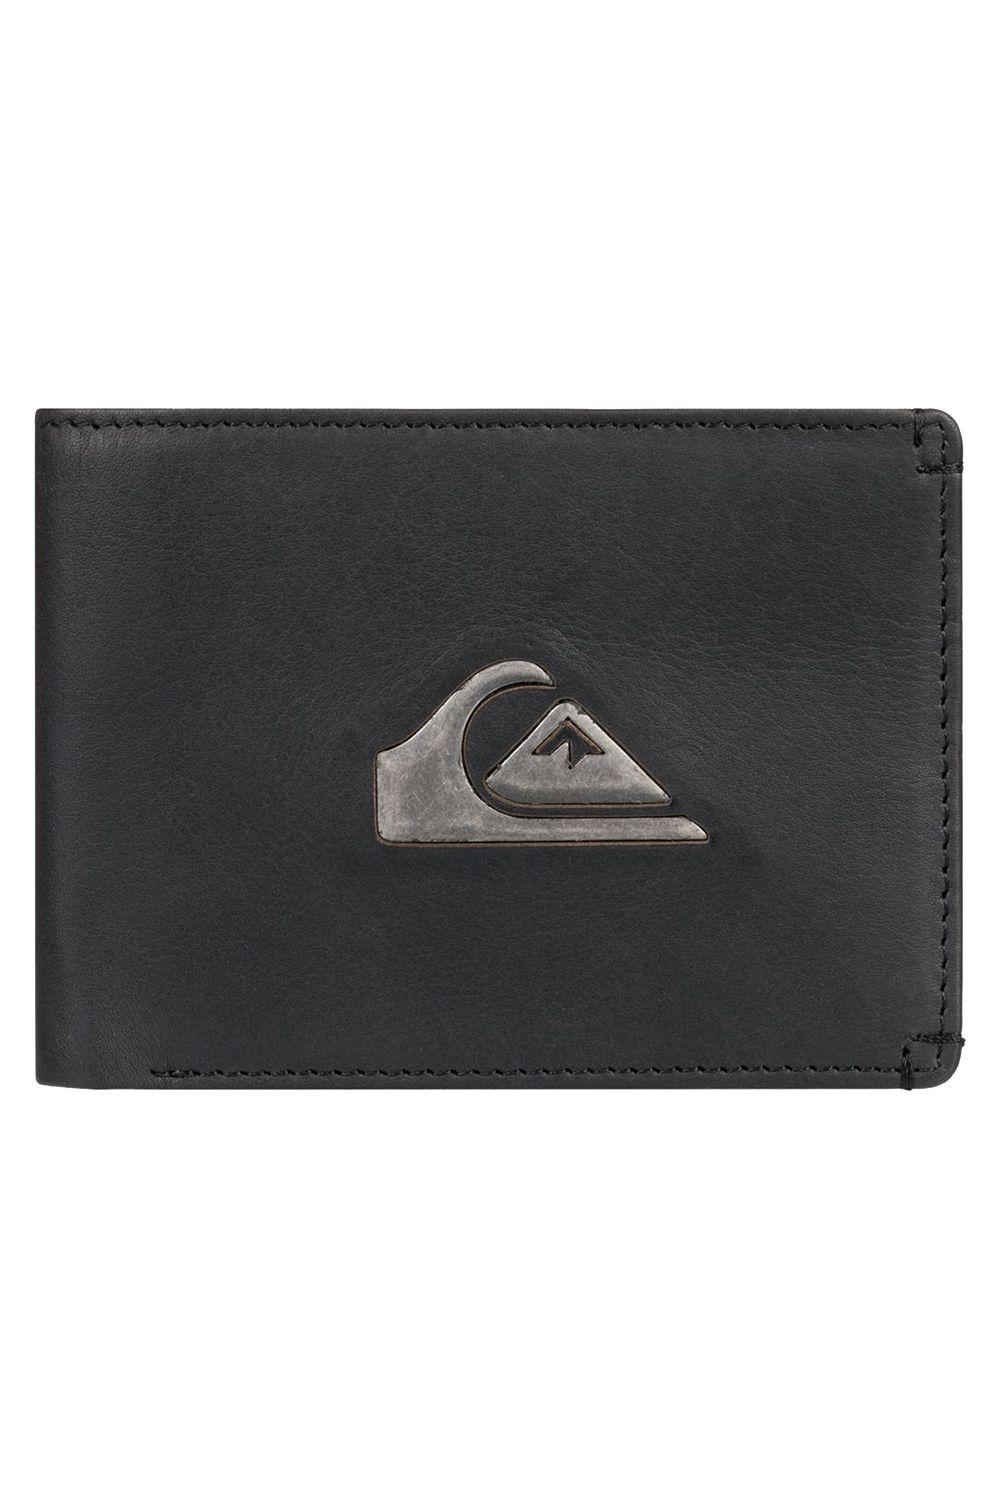 Quiksilver Leather Wallet NEWMISSDOLLARII Black